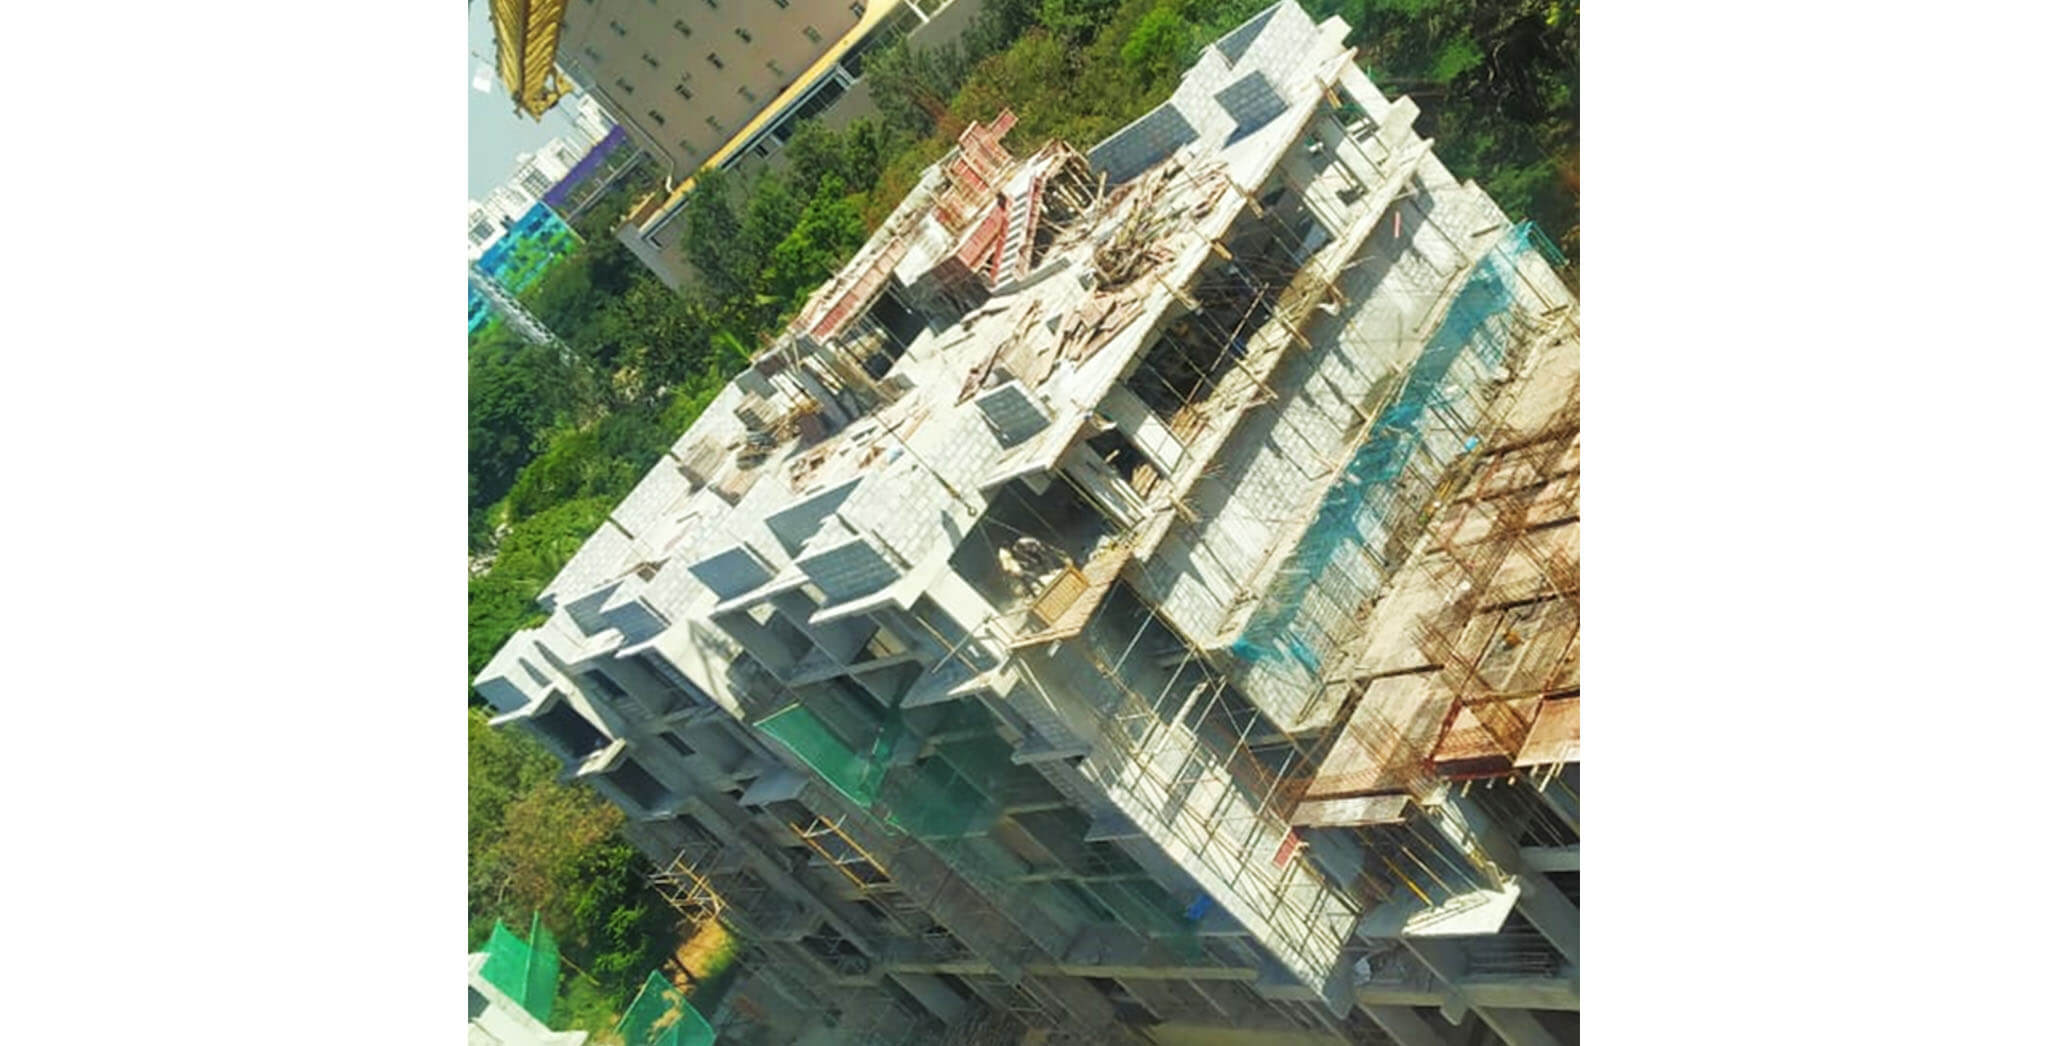 Aug 2020 - A Block: Above Terrace floor SHR & LMR bottom slab concreting completed; 4th floor block work & 3rd floor plastering work-in-progress.